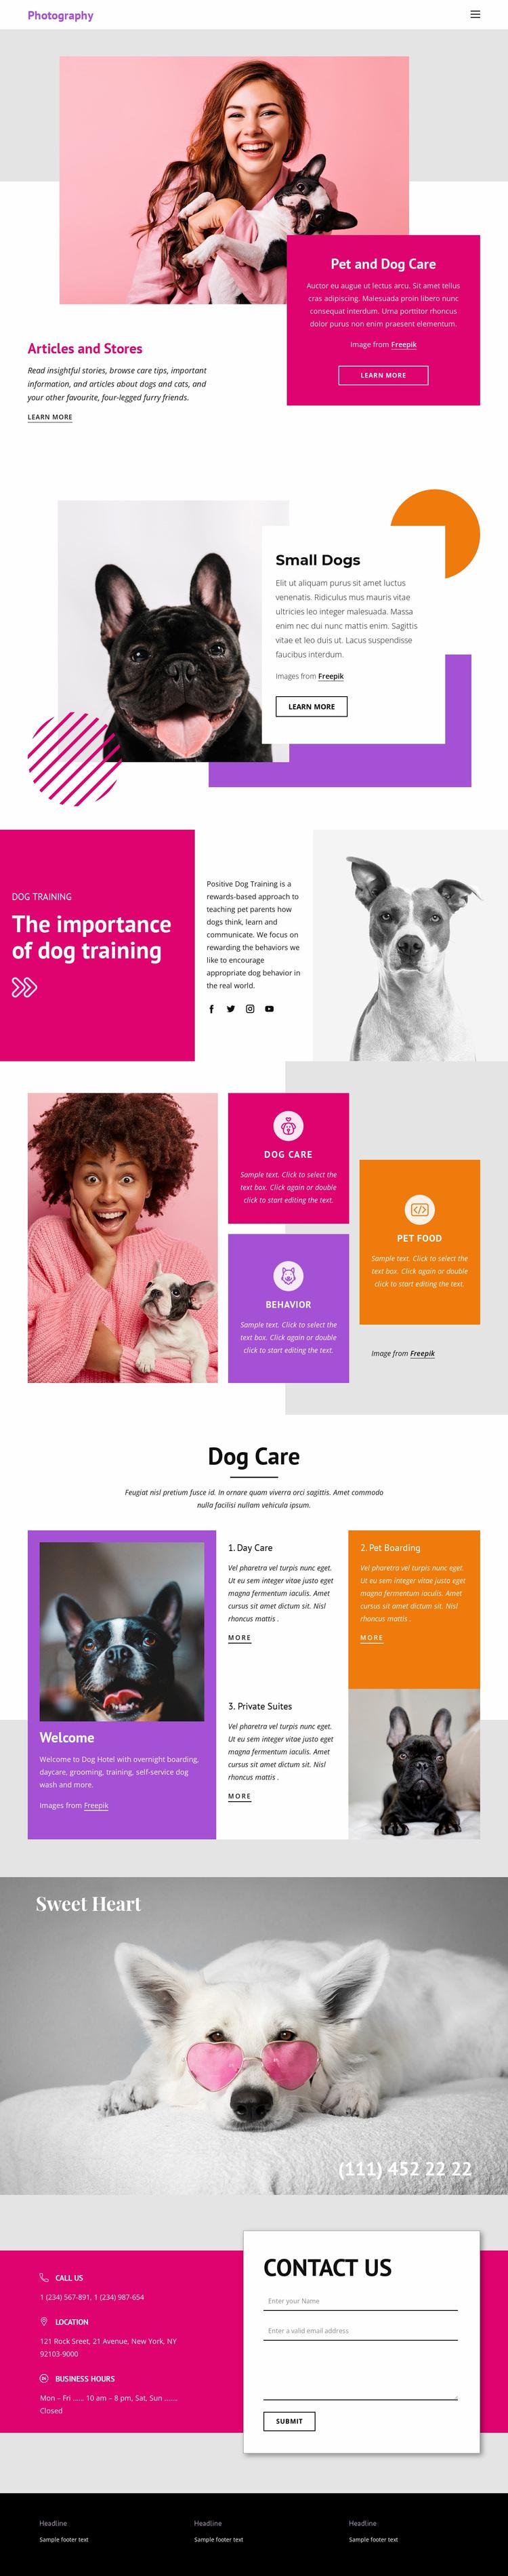 Pets Stories Website Design